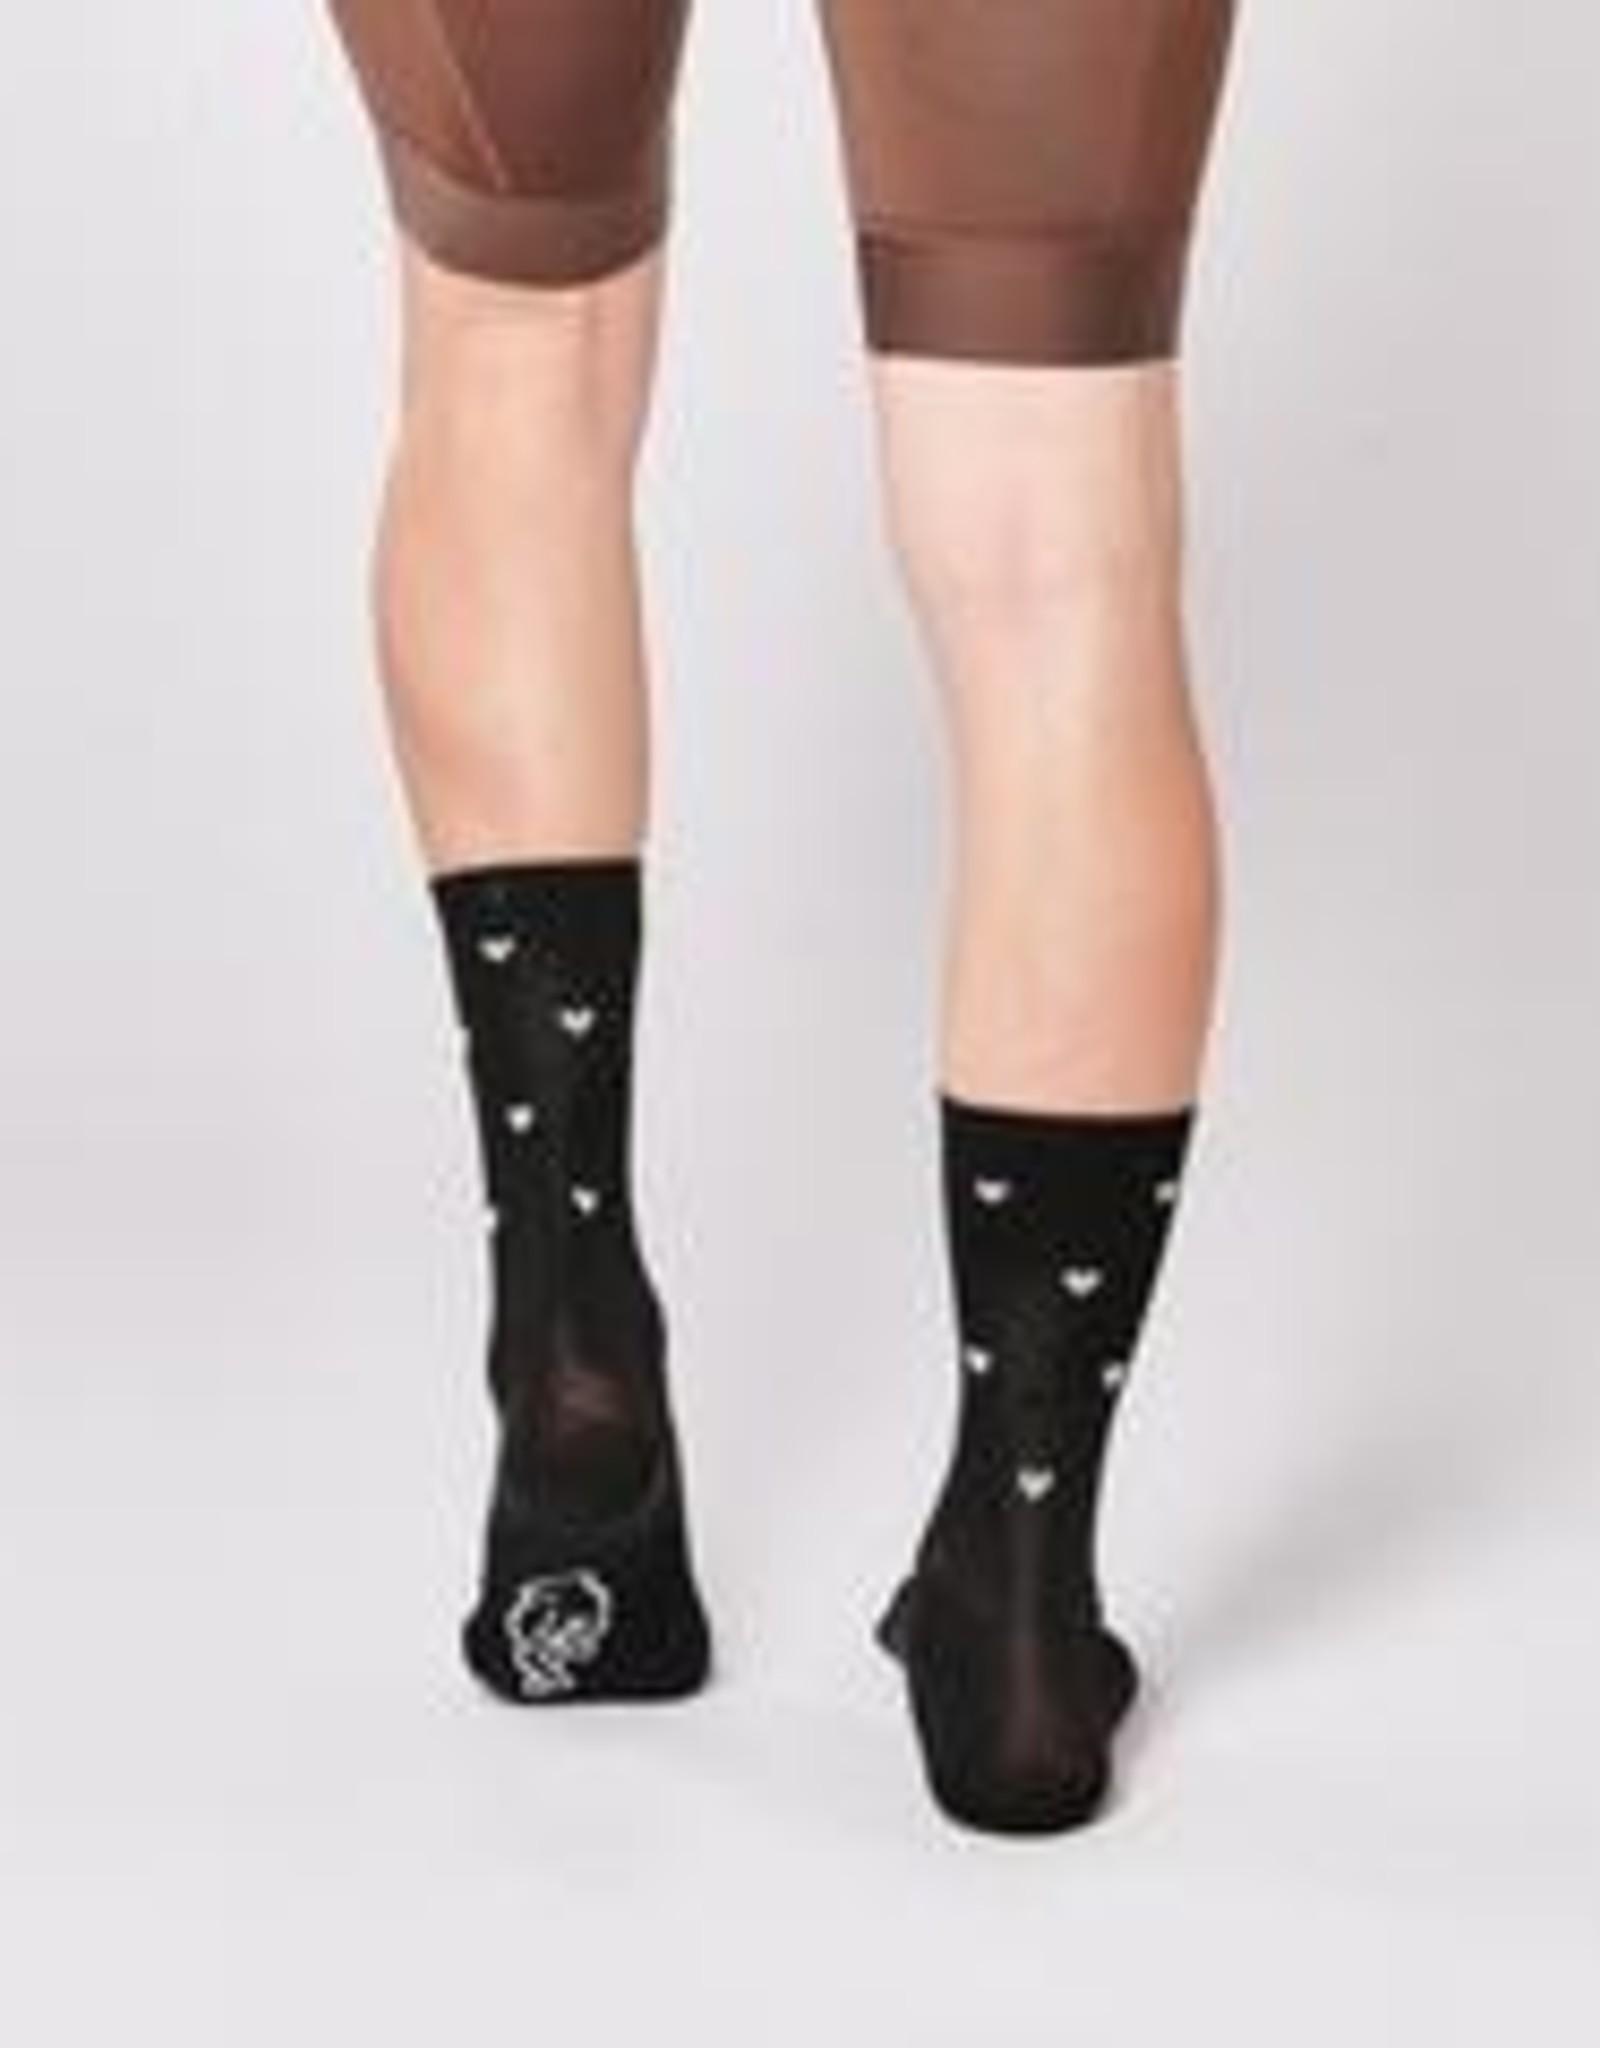 Fingerscrossed Cycling socks Classic Hearts Black  #09_07